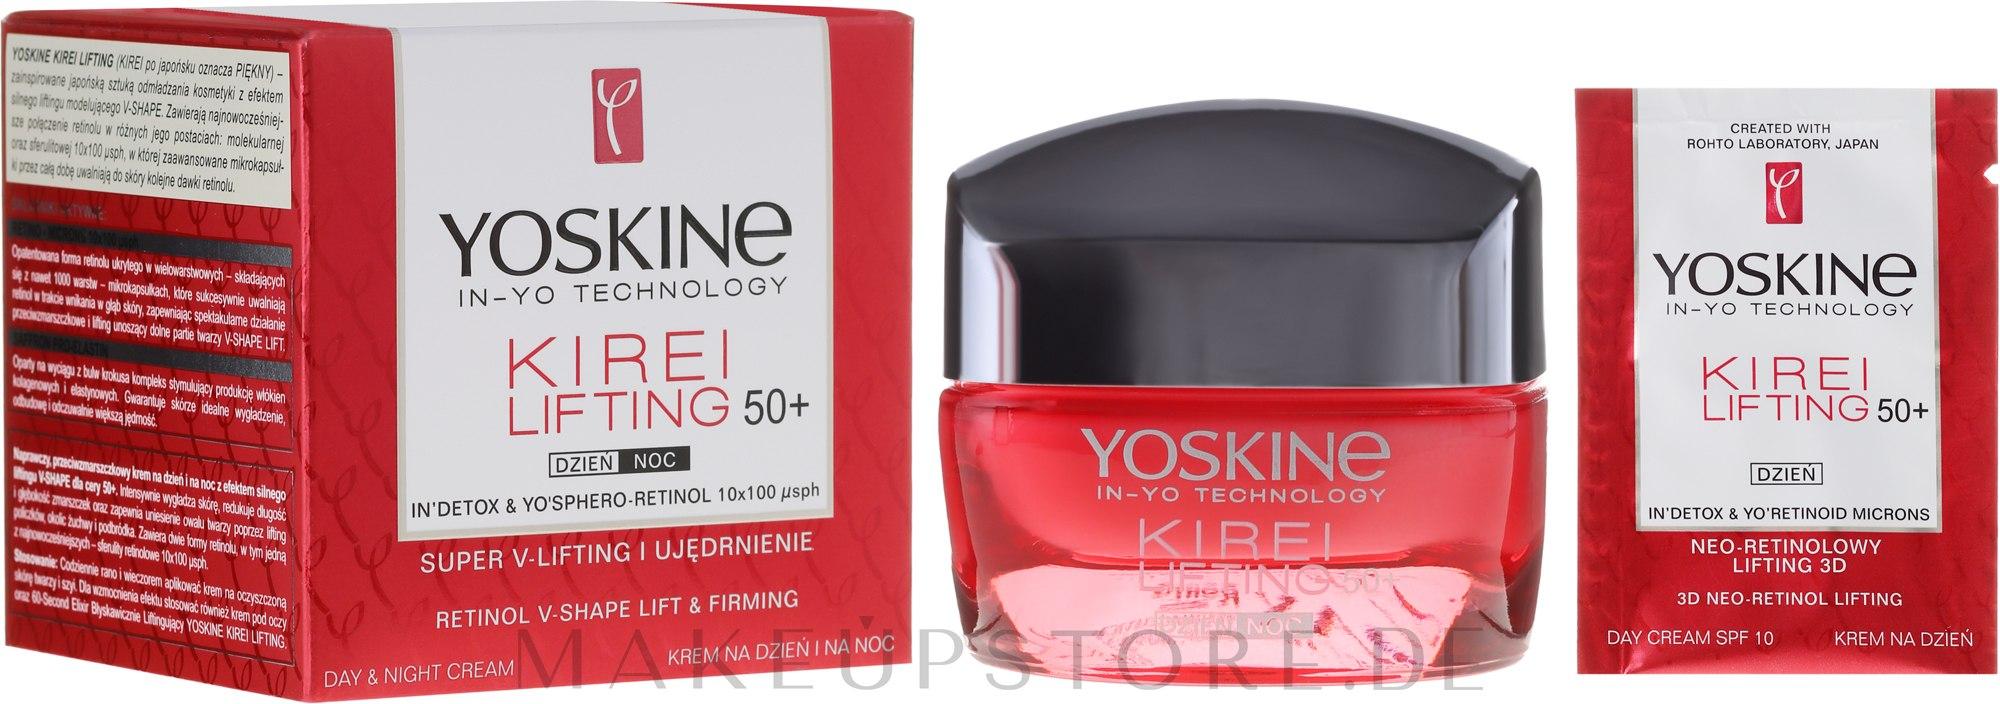 Reparierende Anti-Falten Tages- und Nachtcreme mit kraftvollem V-SHAPE-Lifting-Effekt - Yoskine Kirei Lifting Day Cream 50+ — Bild 50 ml